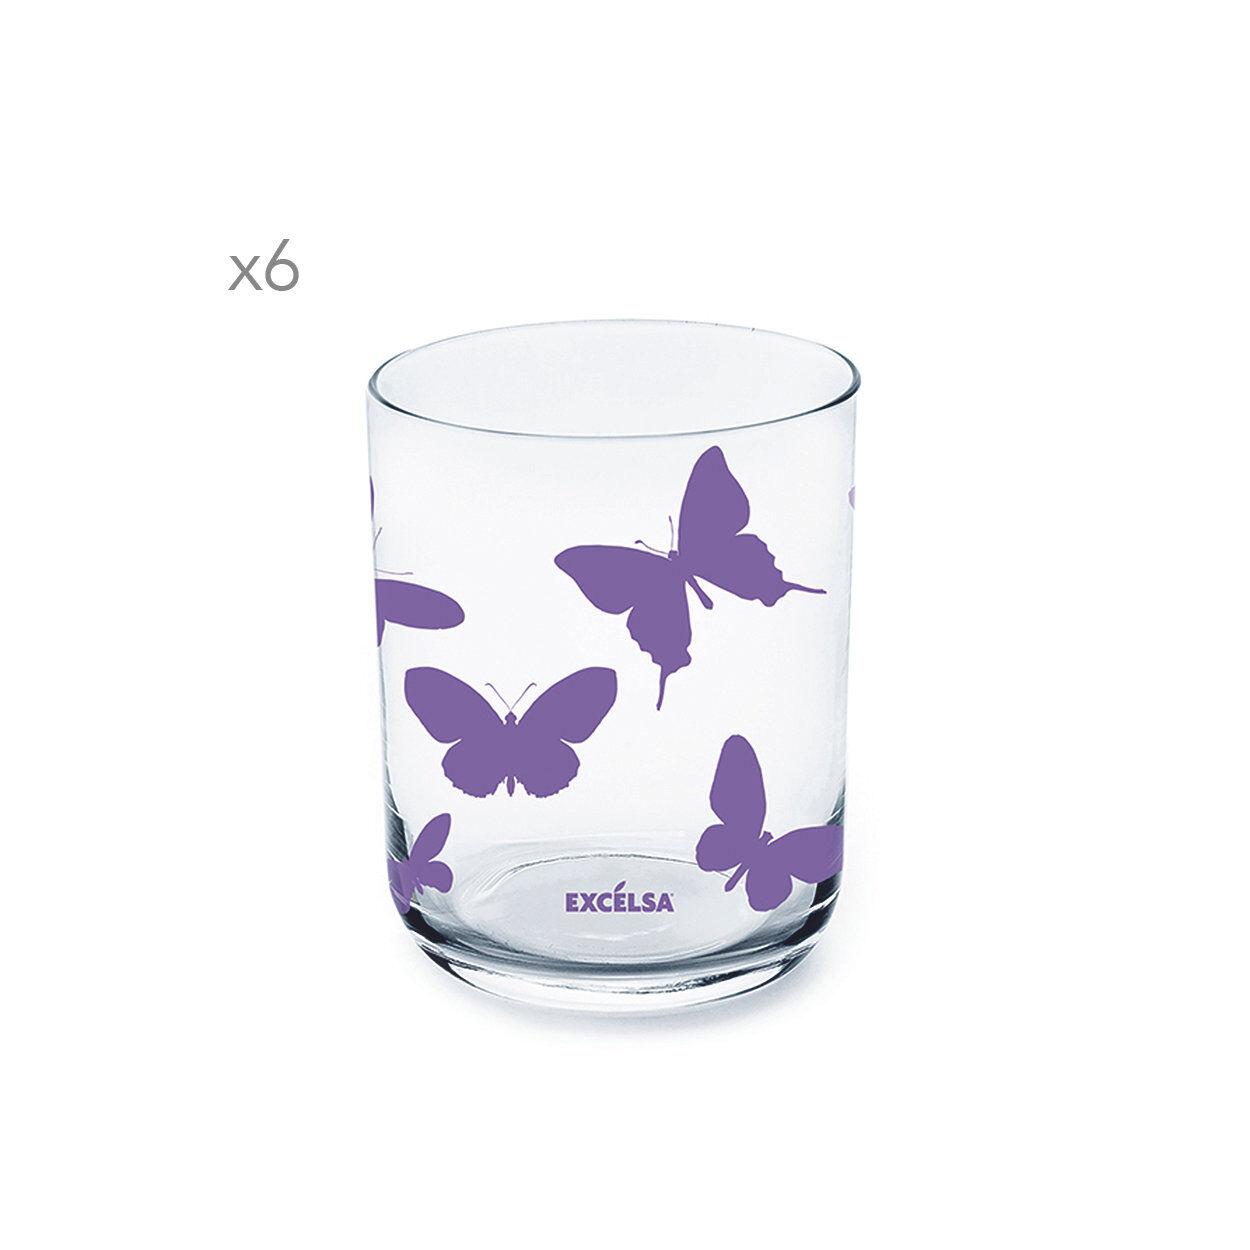 La tavola di primavera Set da 6 bicchieri Enjoy decoro farfalla, lilla